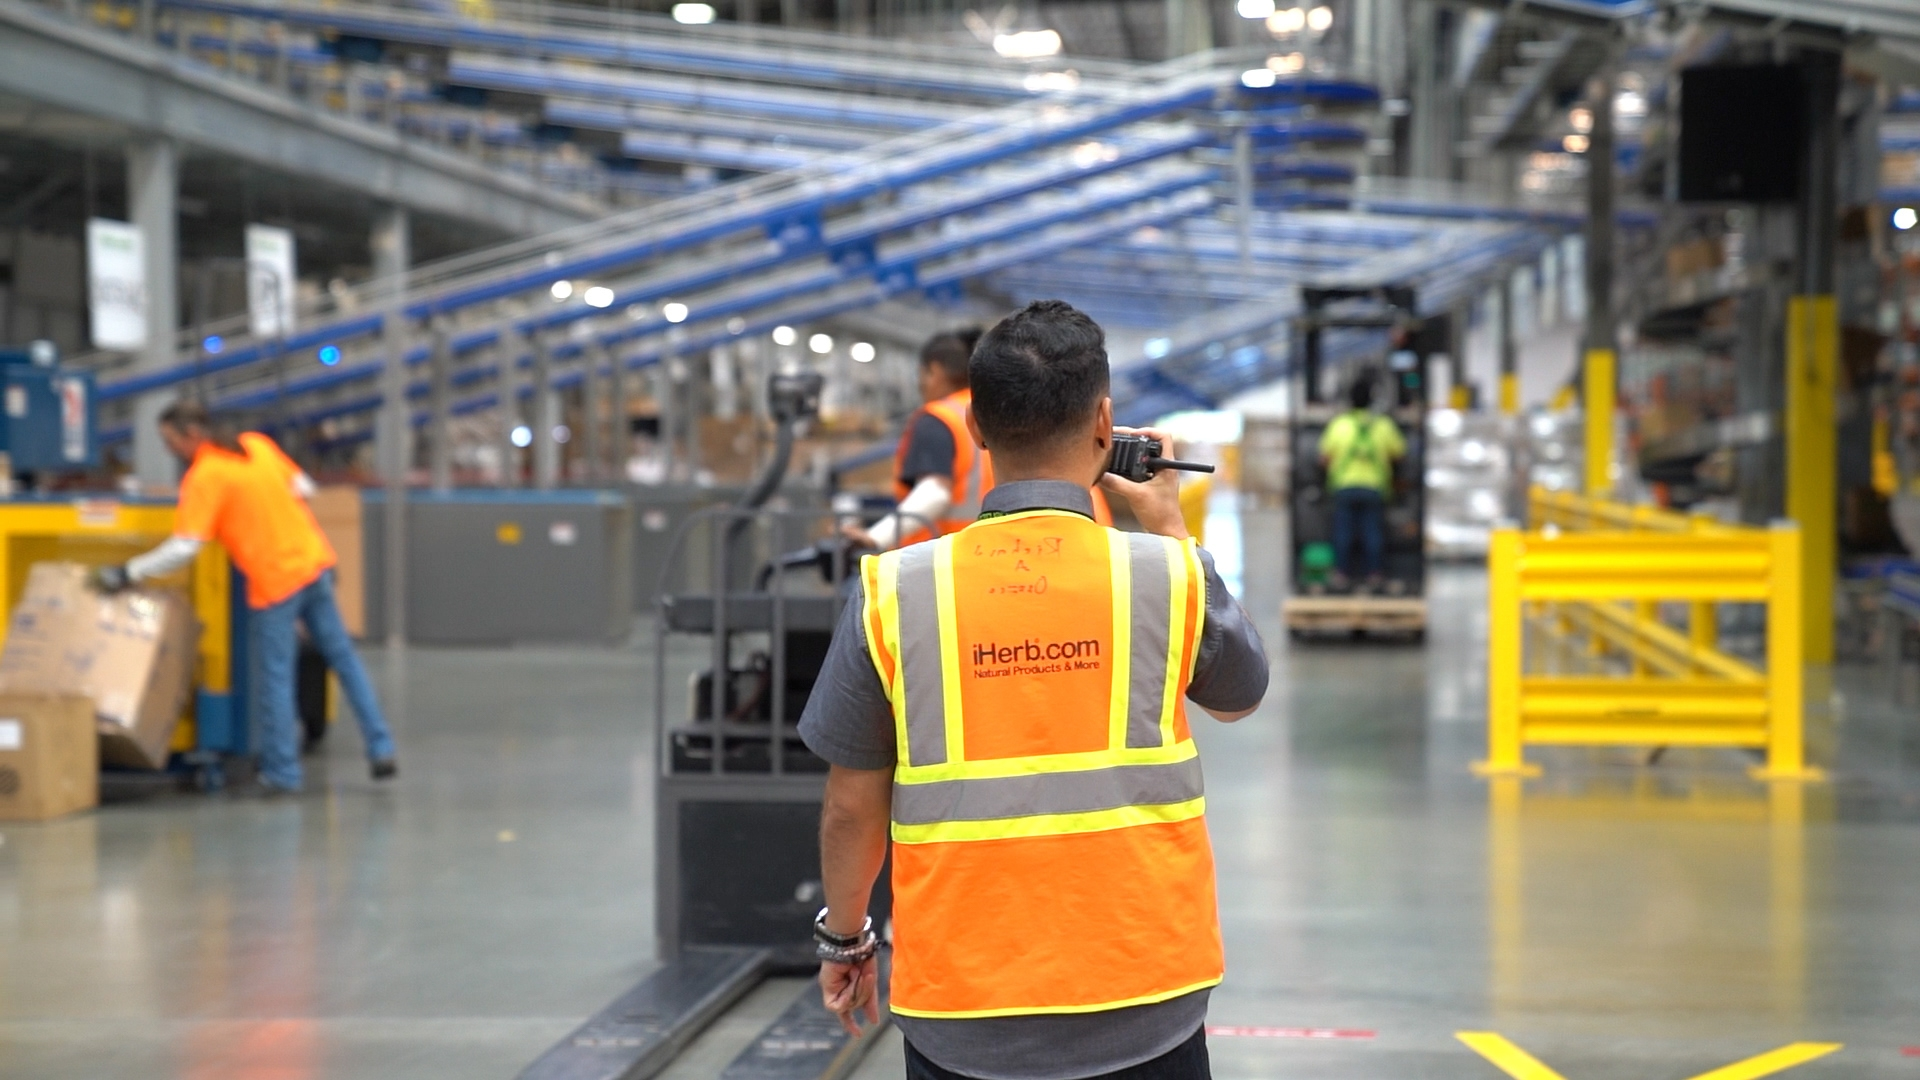 Inside one of iHerb's warehouses